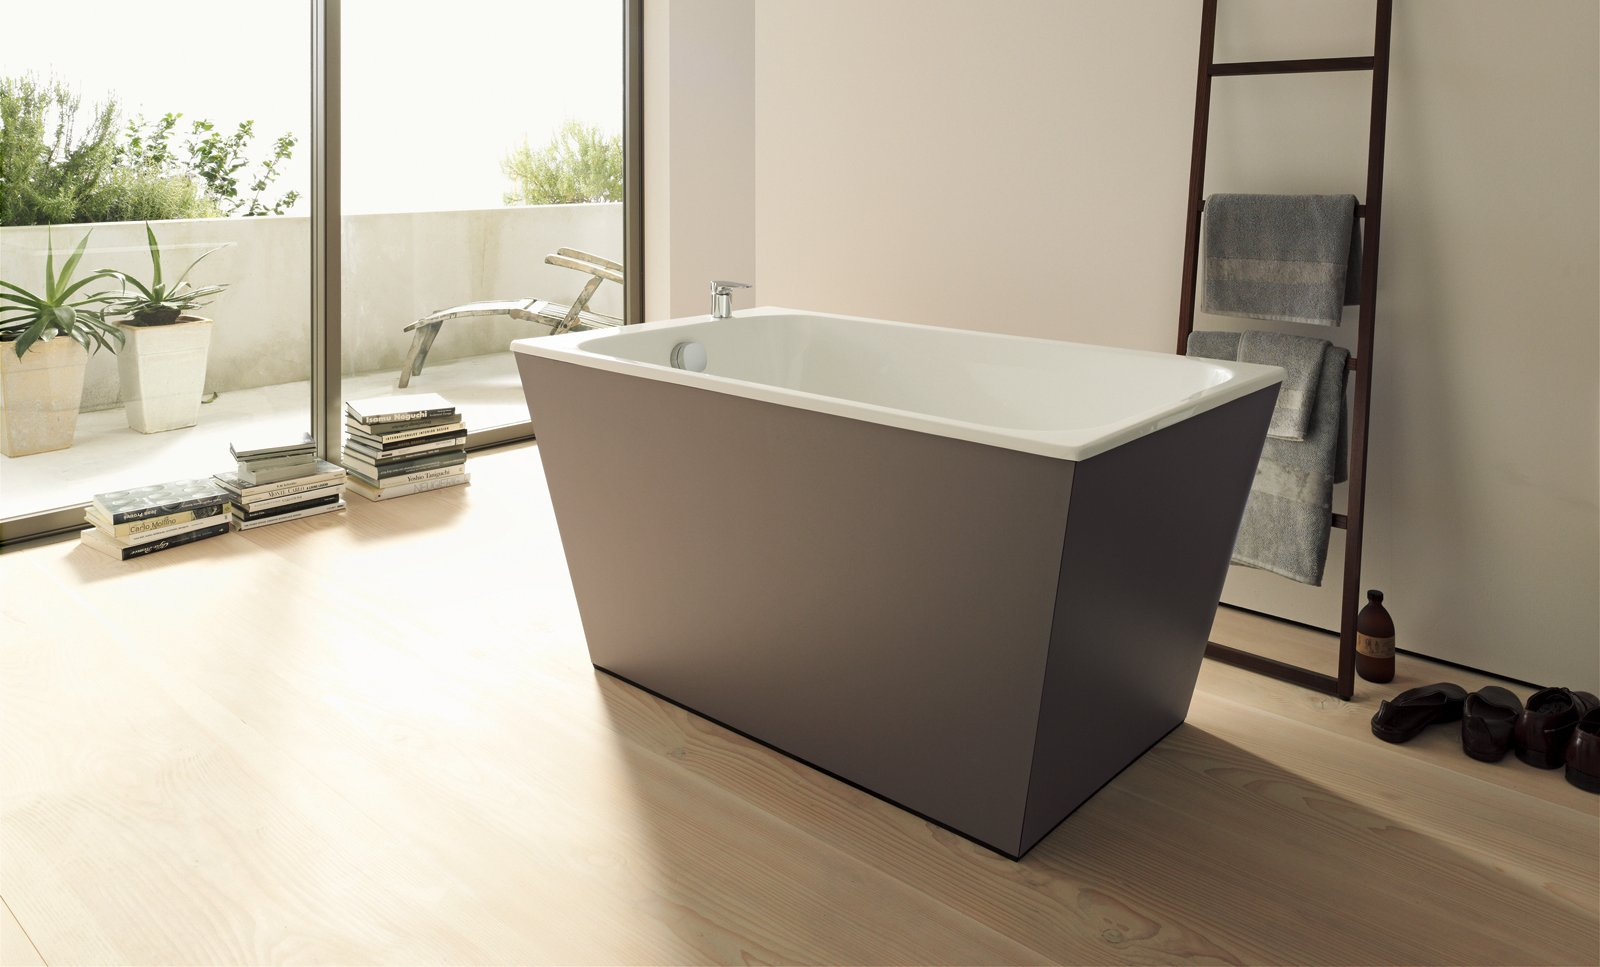 Vasca Da Bagno Freestanding Prezzi : Vasche da bagno prezzo design per la casa aradz